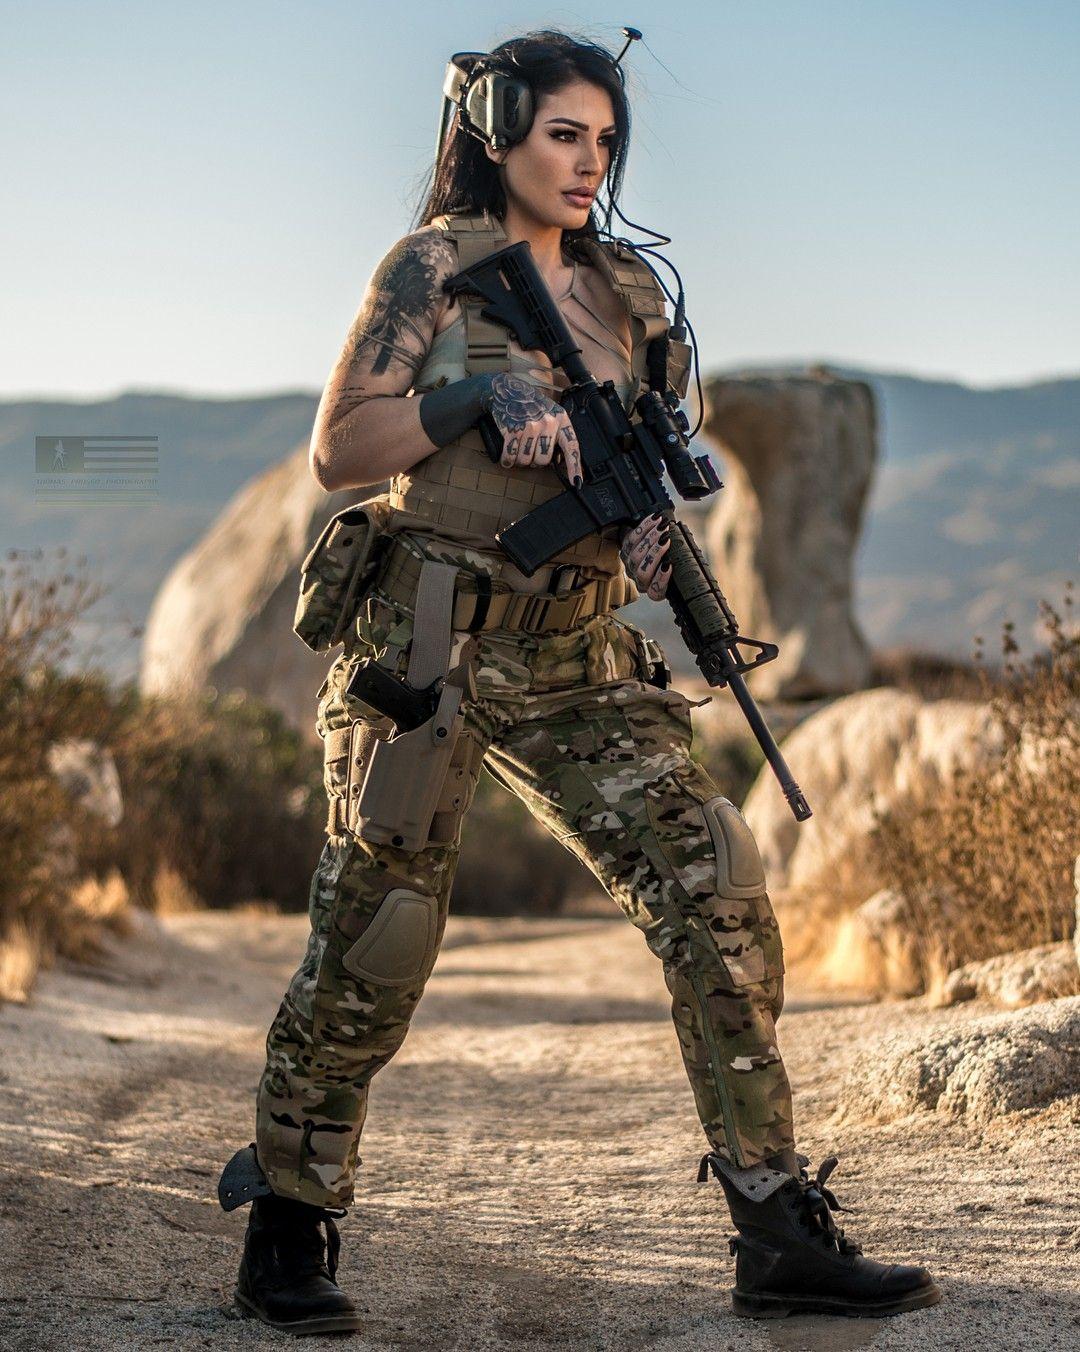 Pin by Craig C. on WMs Semper Fi | Army women, Women